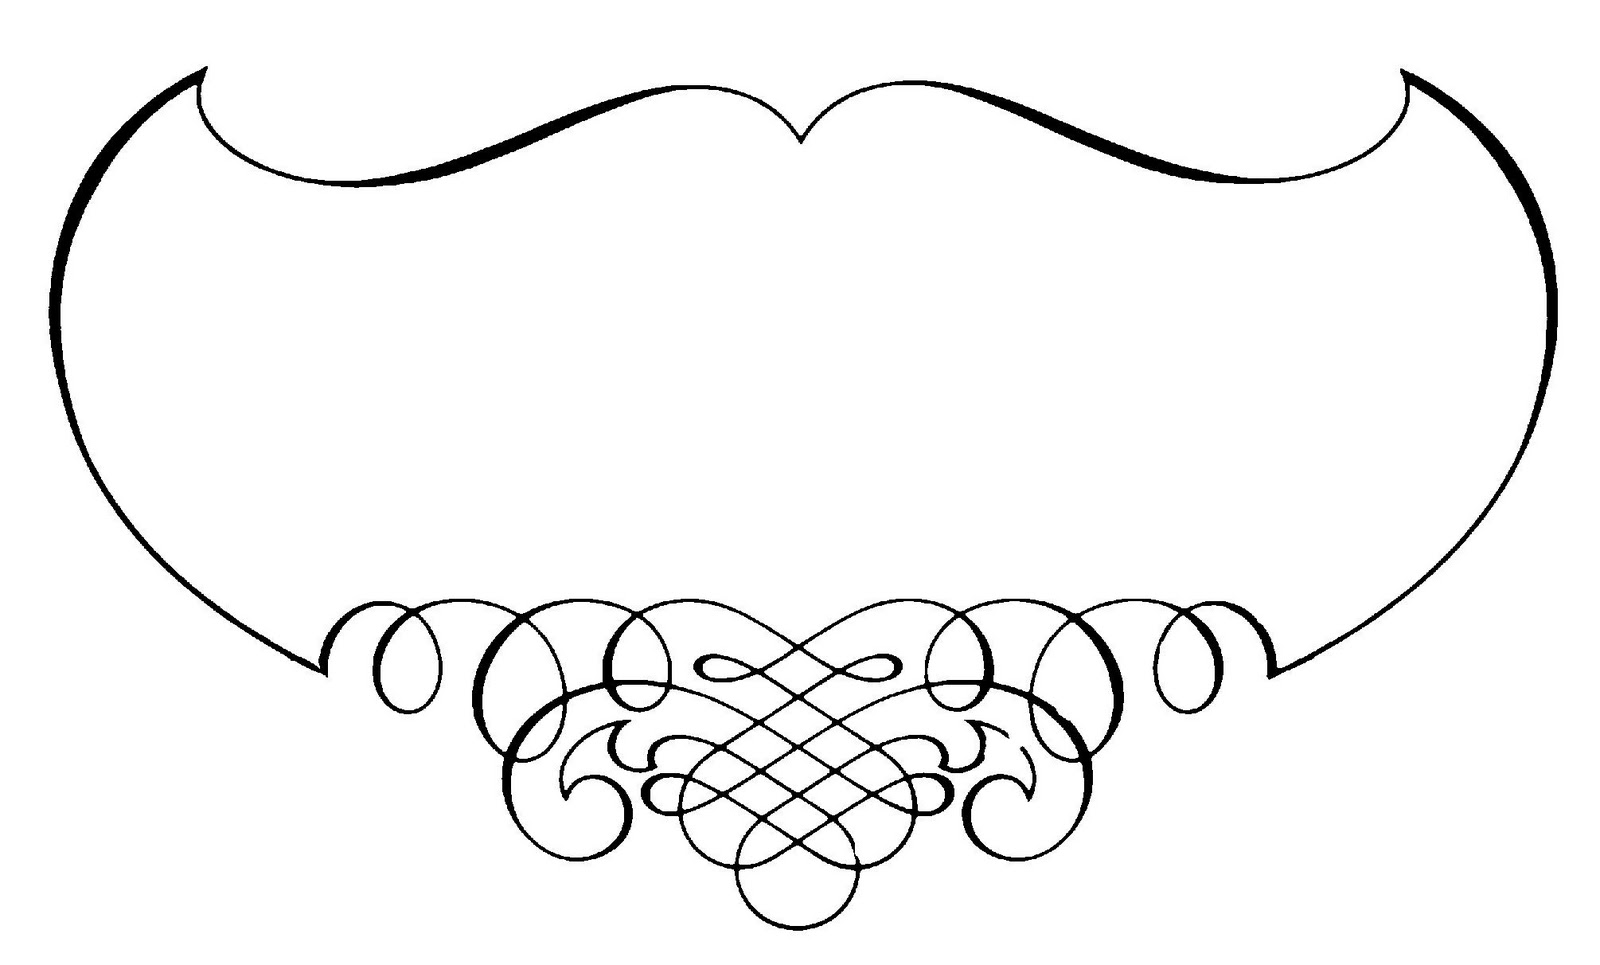 Free Free Elegant Borders Download Free Clip Art Free